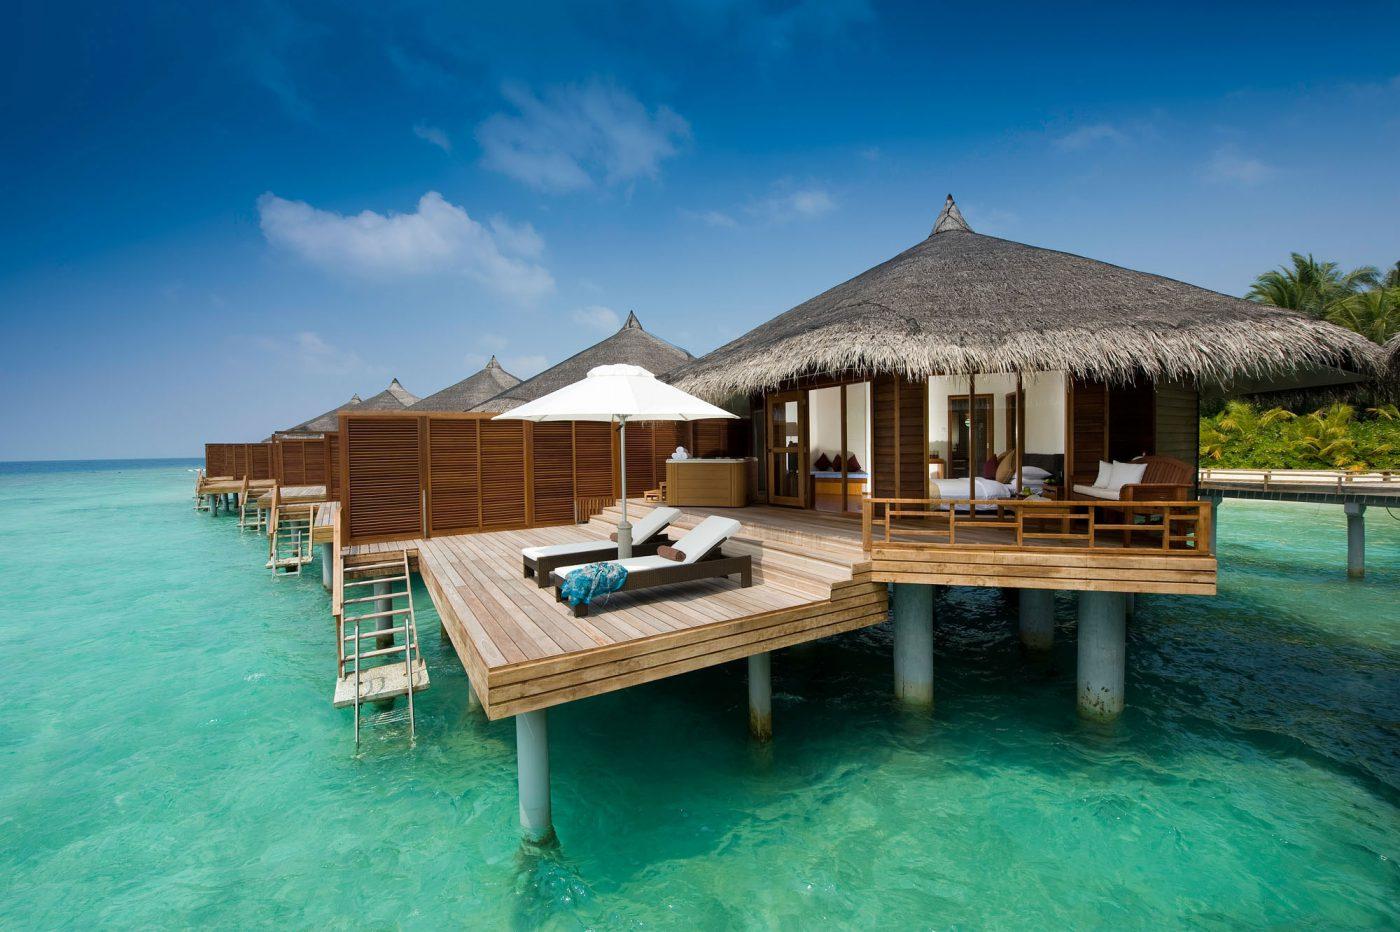 6 Tips yang Harus Kamu Ketahui Sebelum Ke Maldives